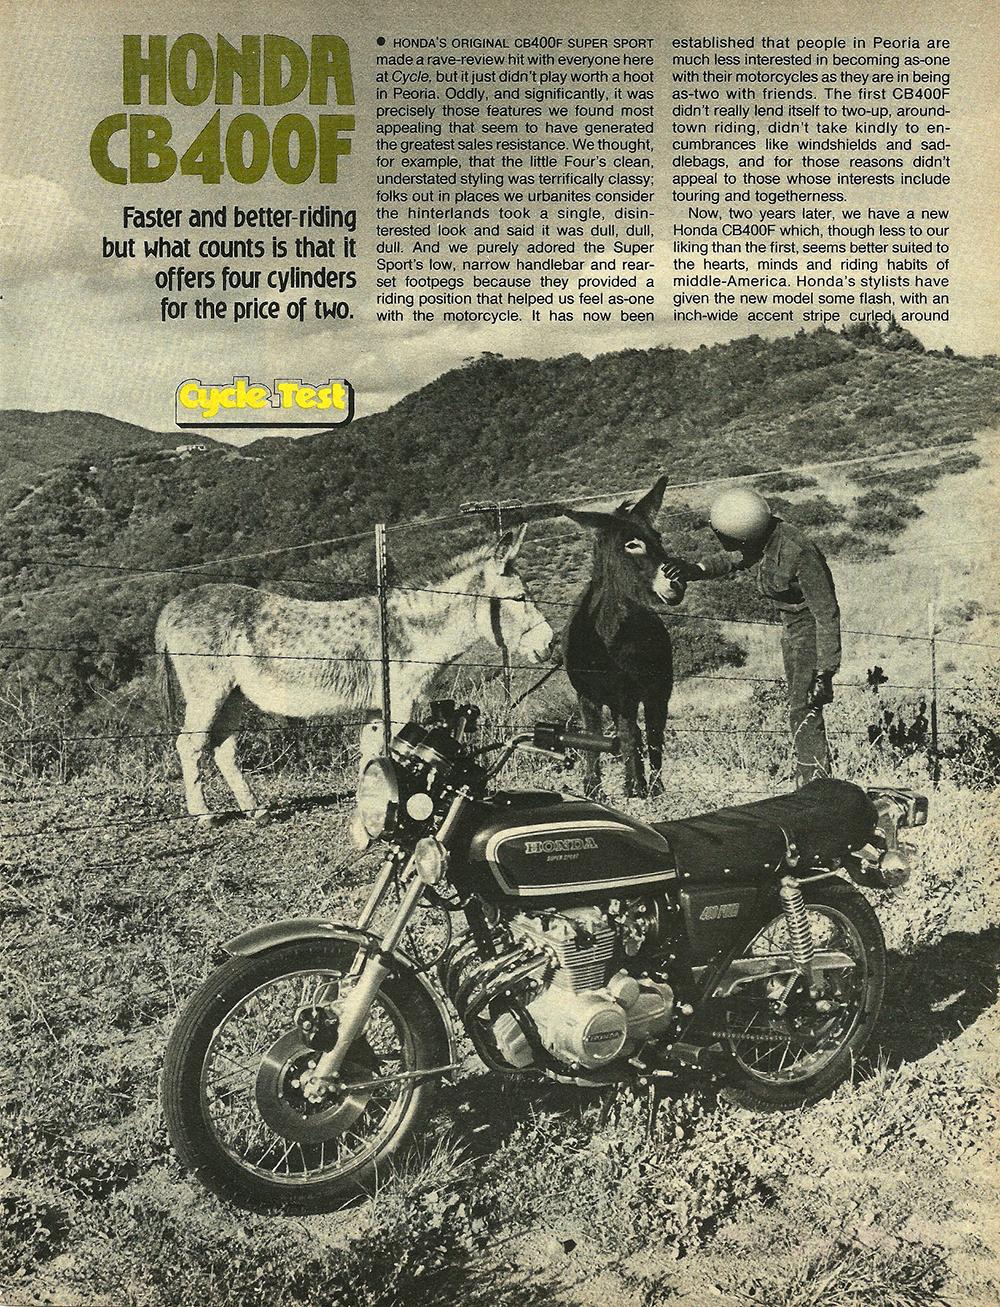 1977 Honda CB400F road test 01.jpg